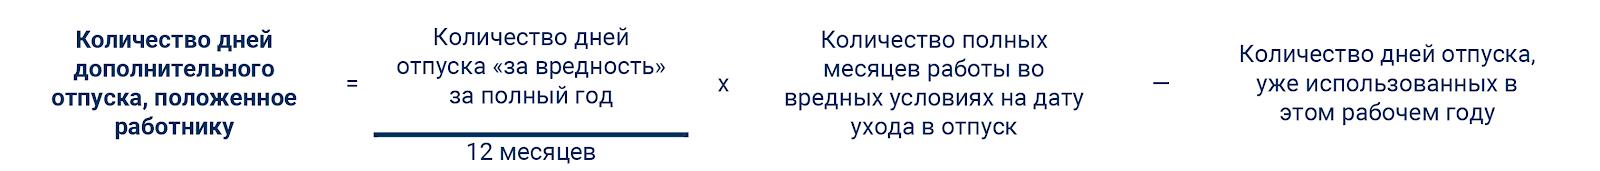 формула количество доп отпуска по вредности